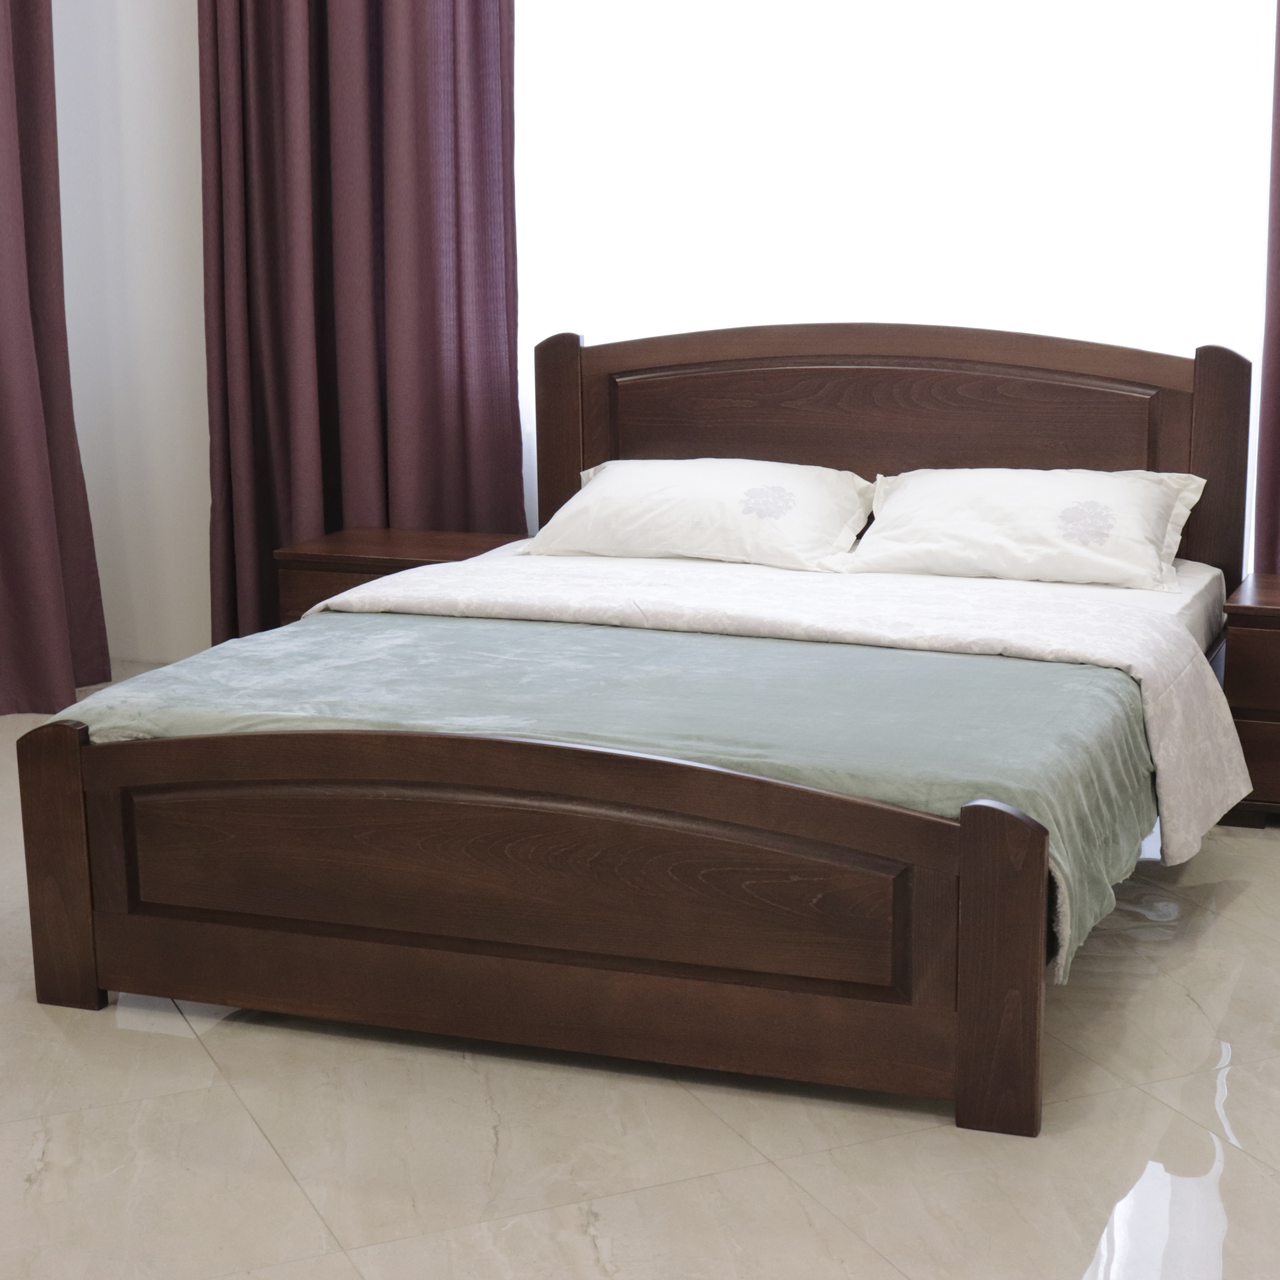 Ліжко дерев'яне двоспальне Едель (масив бука)